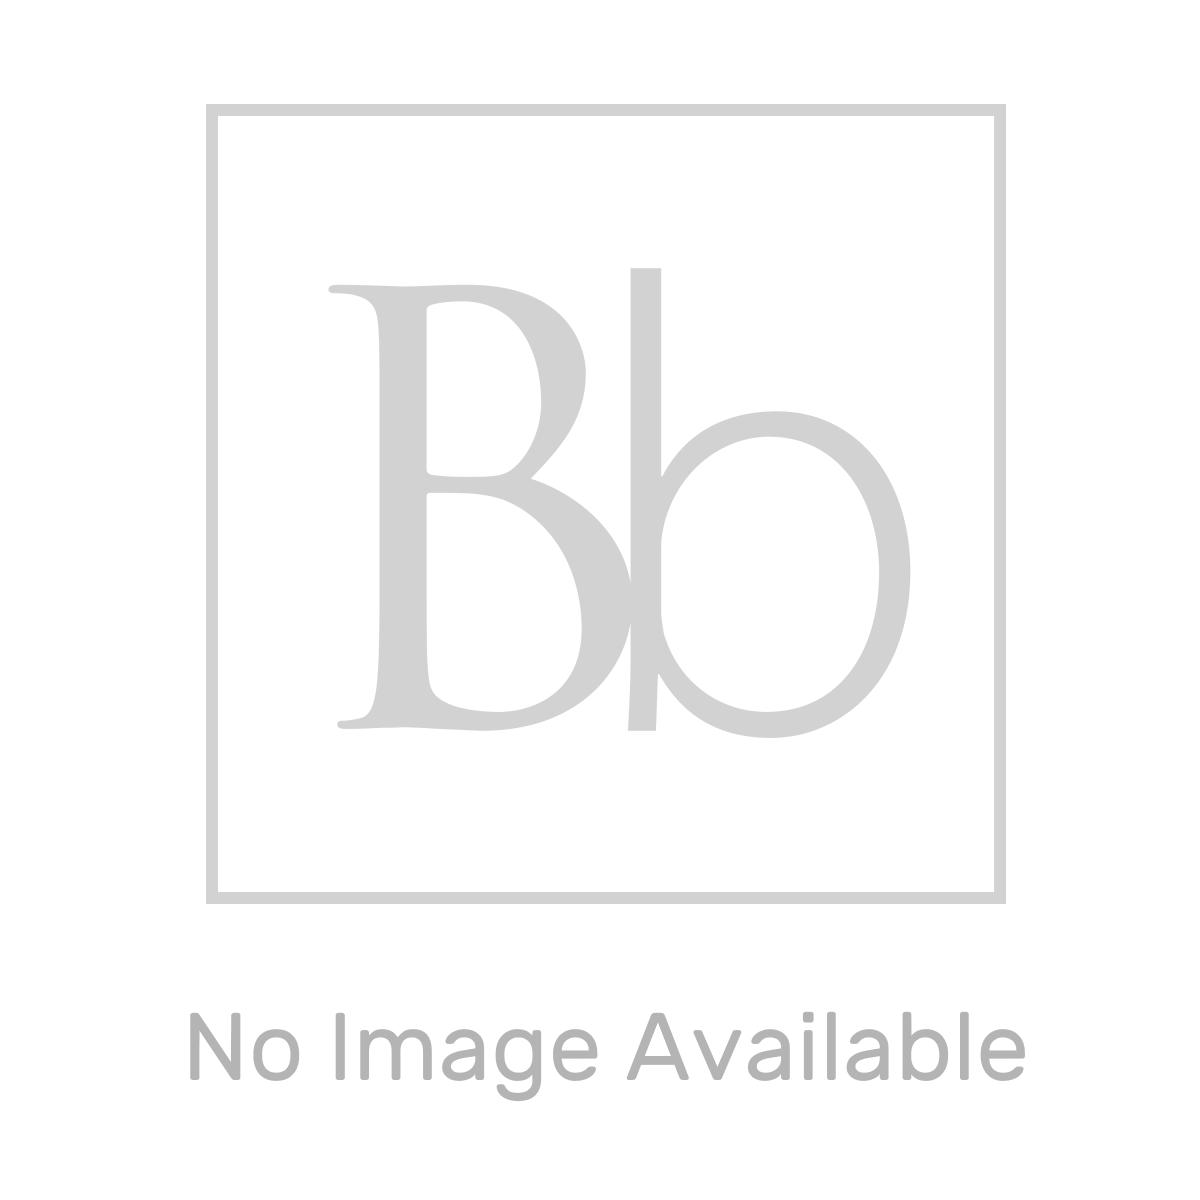 RAK Washington White Bathroom Mirror 650mm